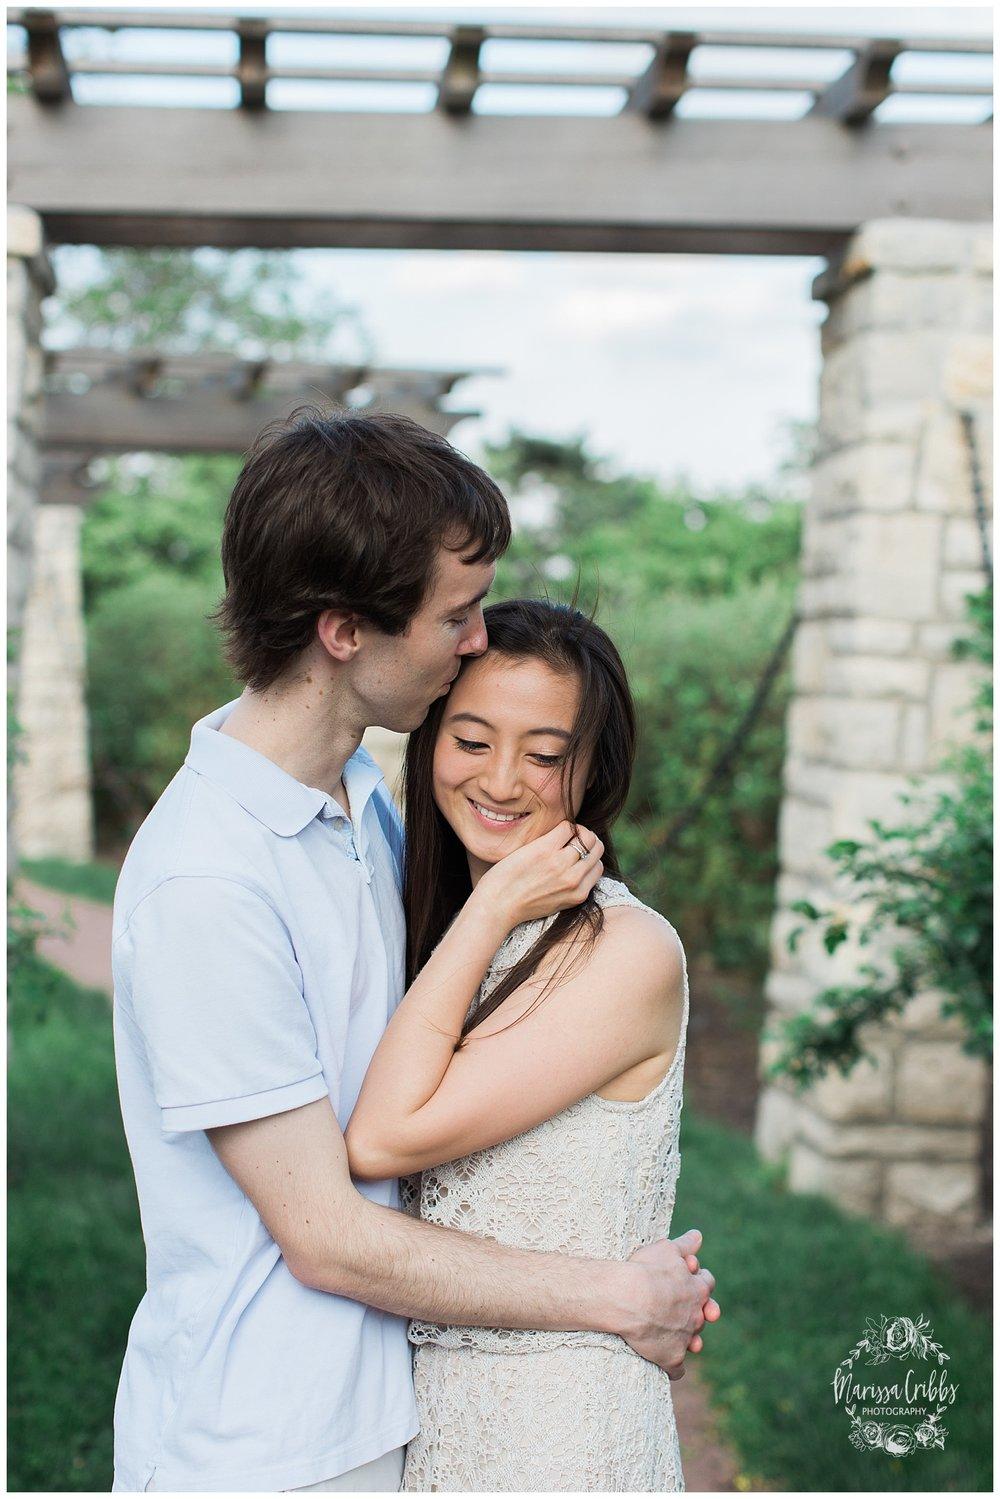 Jenny & Jonathan Engagement | Loose Park Engagement Photos | KC Photographers | Marissa Cribbs Photography | KC Wedding Photographers_0819.jpg